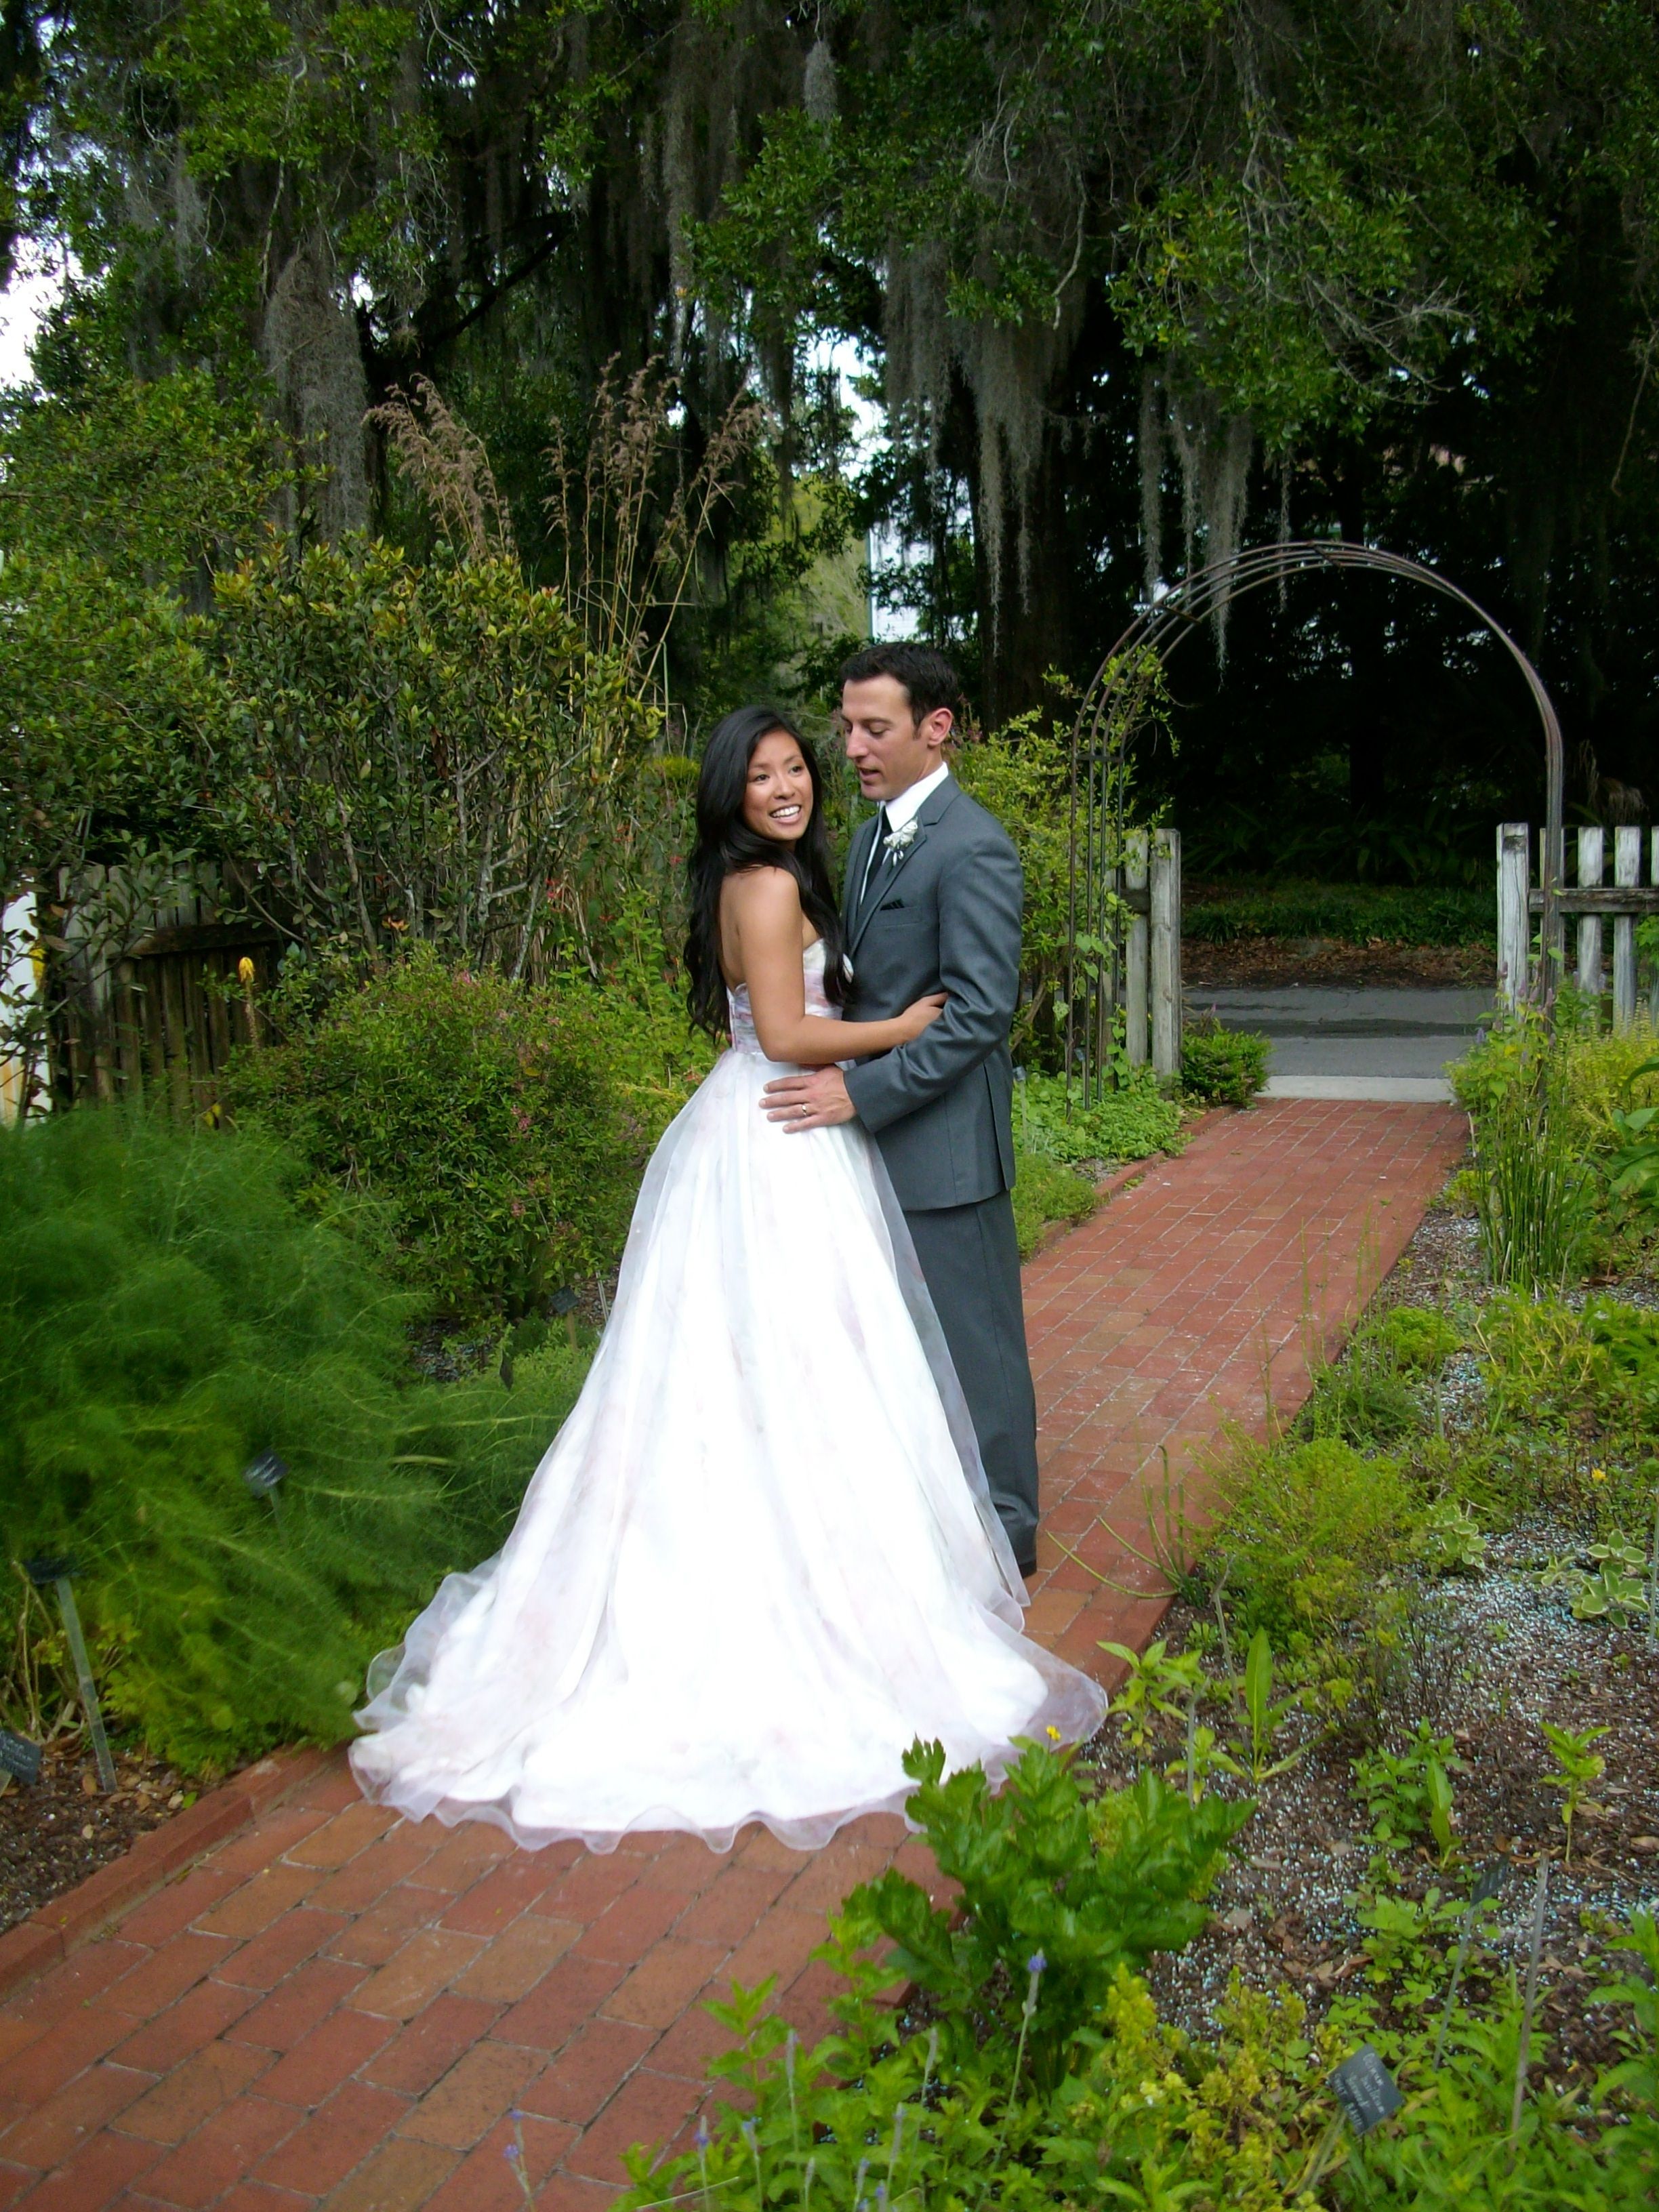 Bride And Groom At Khurana Singh P Leu Gardens Orlando FL After The Wedding Ceremony